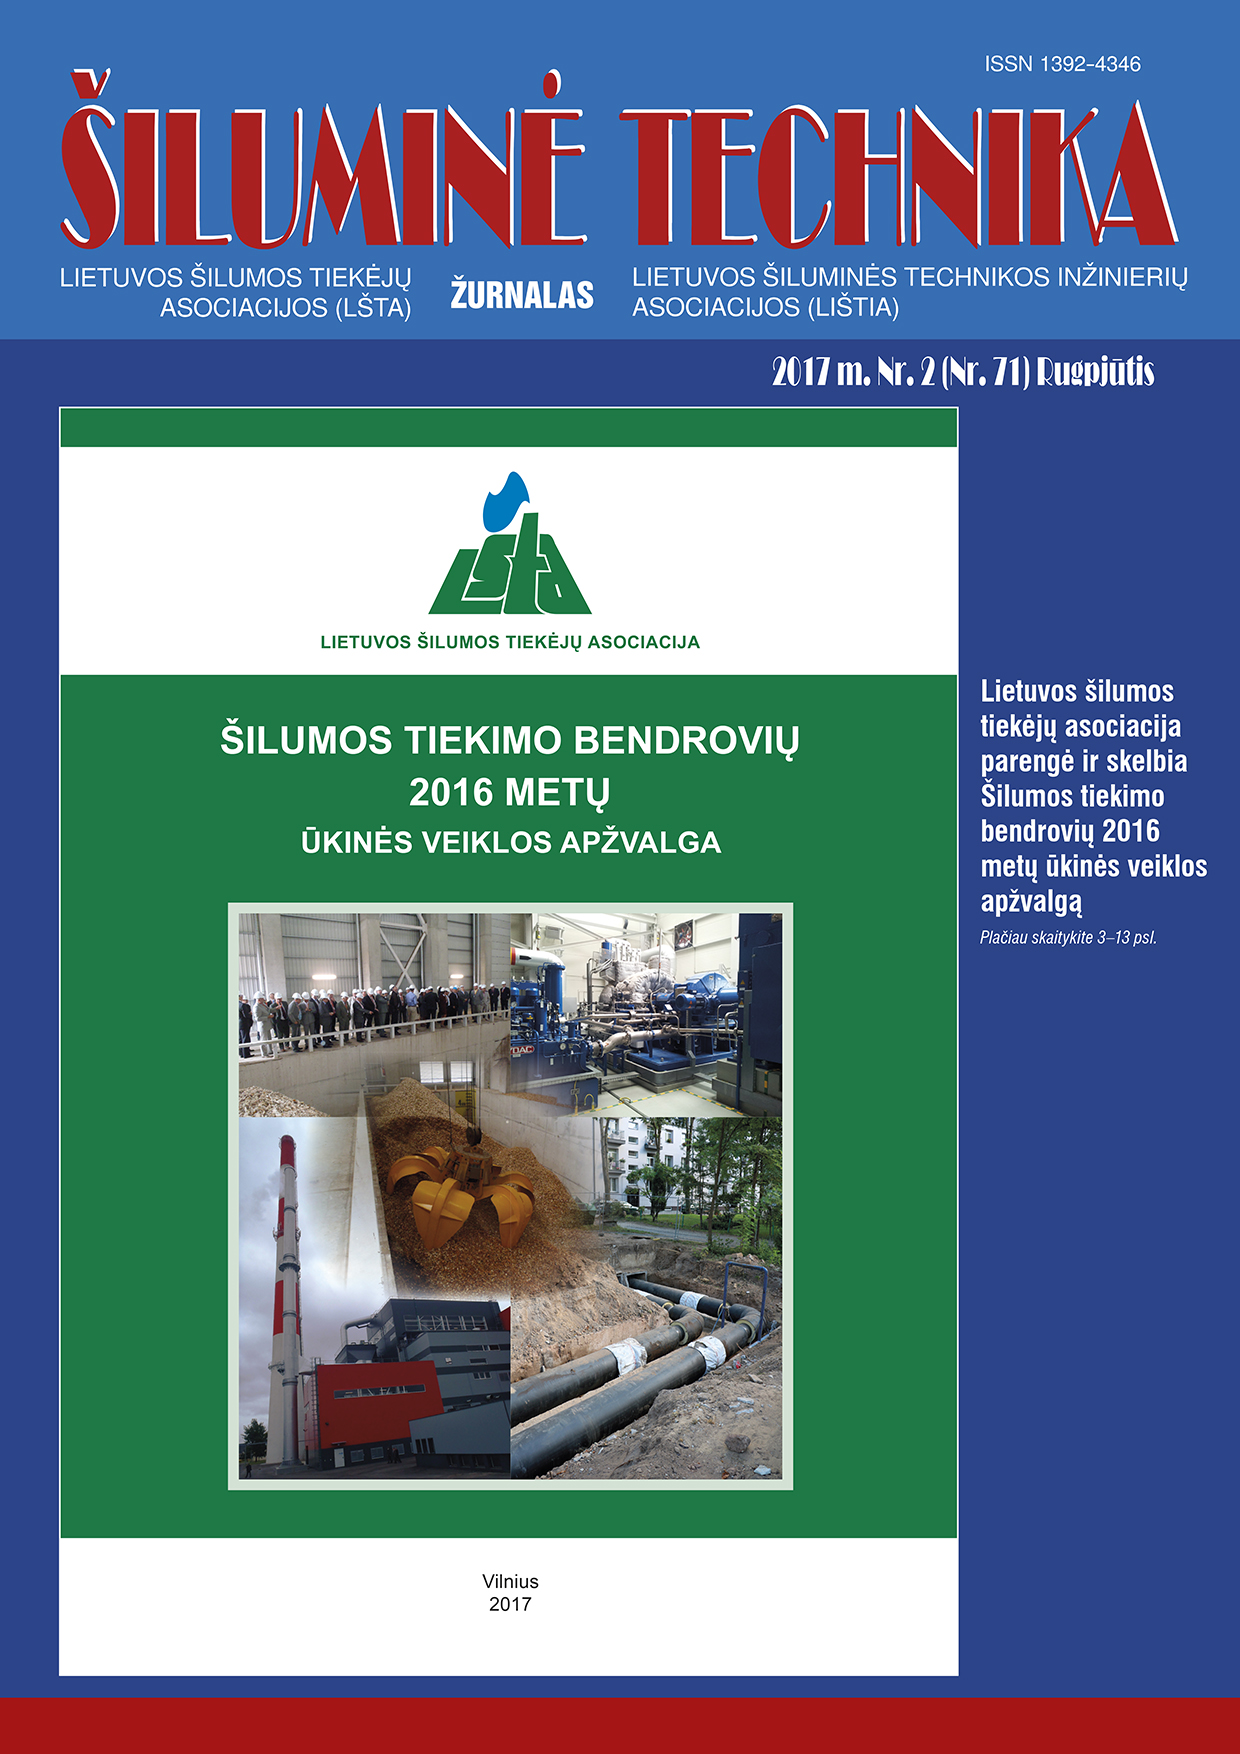 33955_LSTA_Silumine_technika_Nr_71_cover.jpg